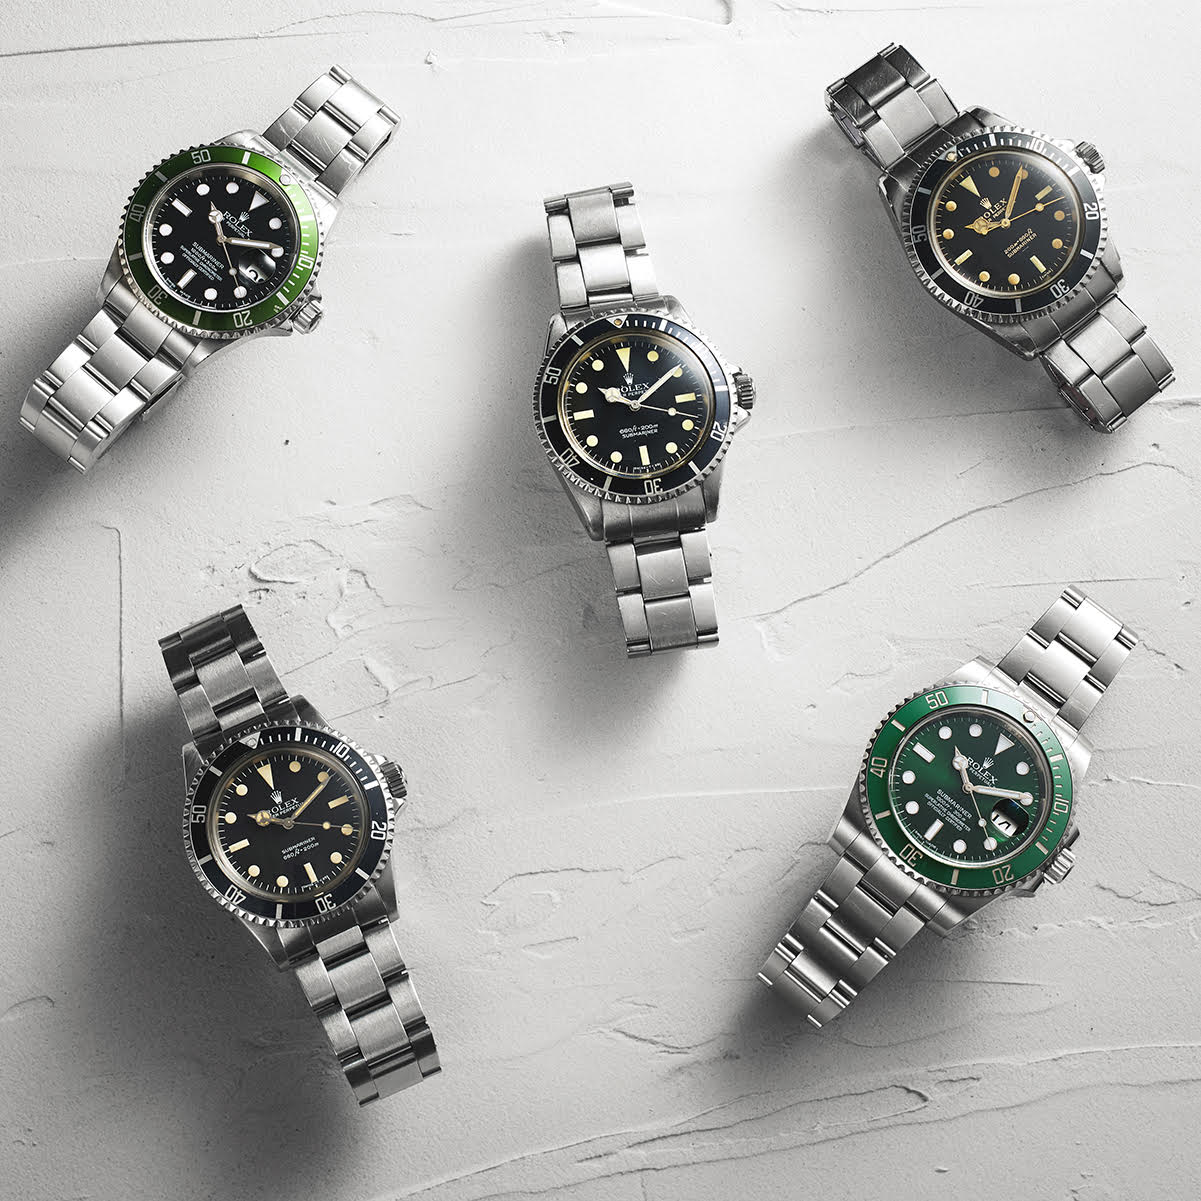 Important Watches Hammer Auction by Kaplans - MondaniWeb